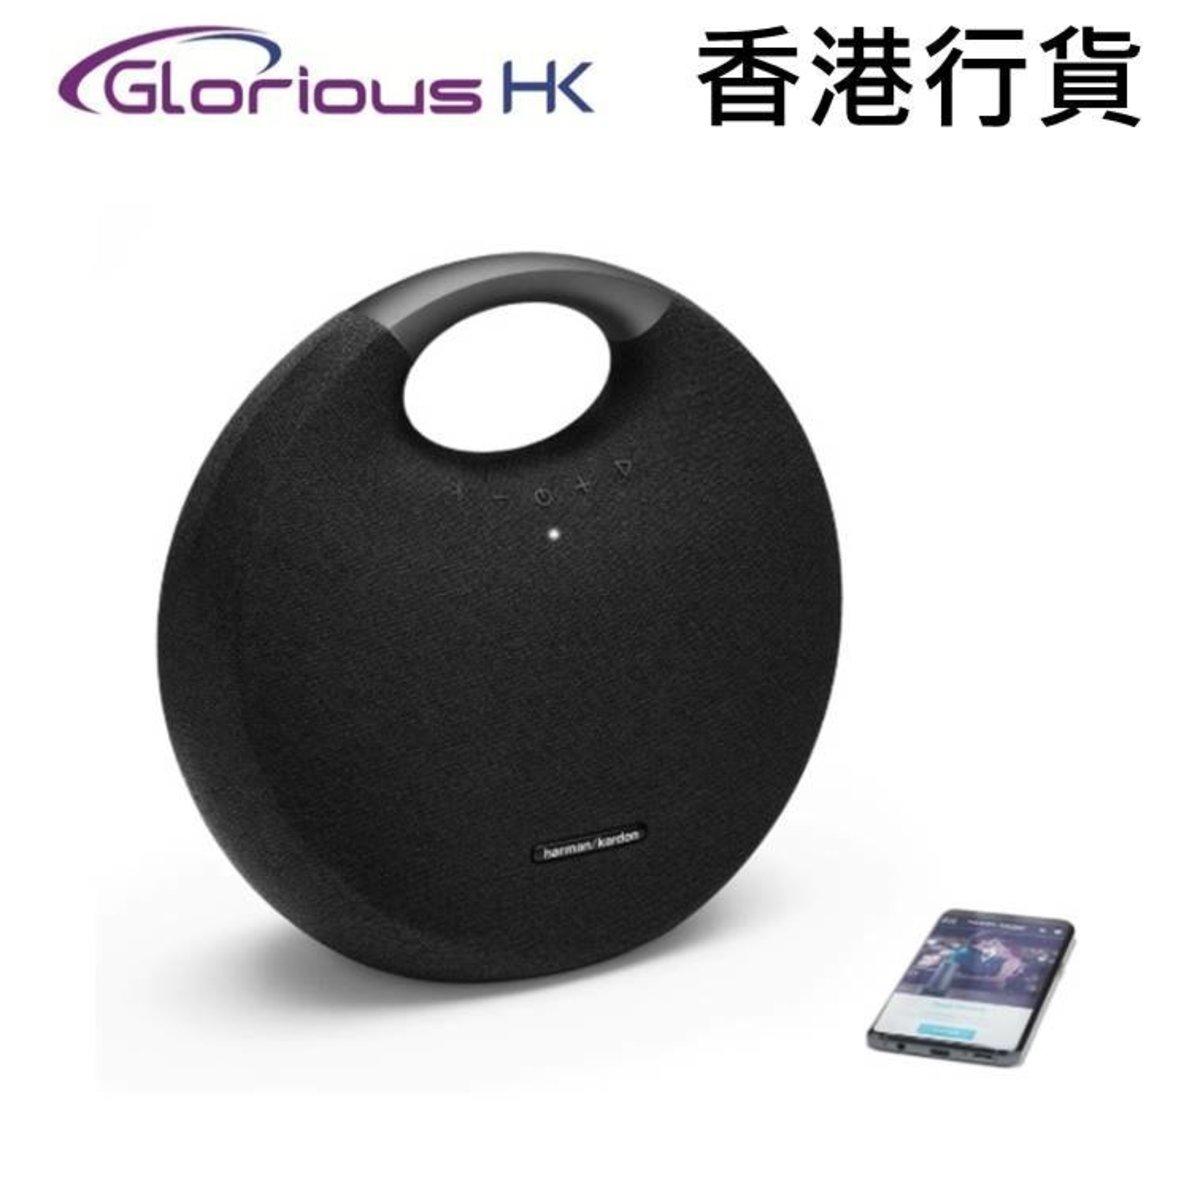 ONYX STUDIO 6 無線喇叭 黑色 香港行貨